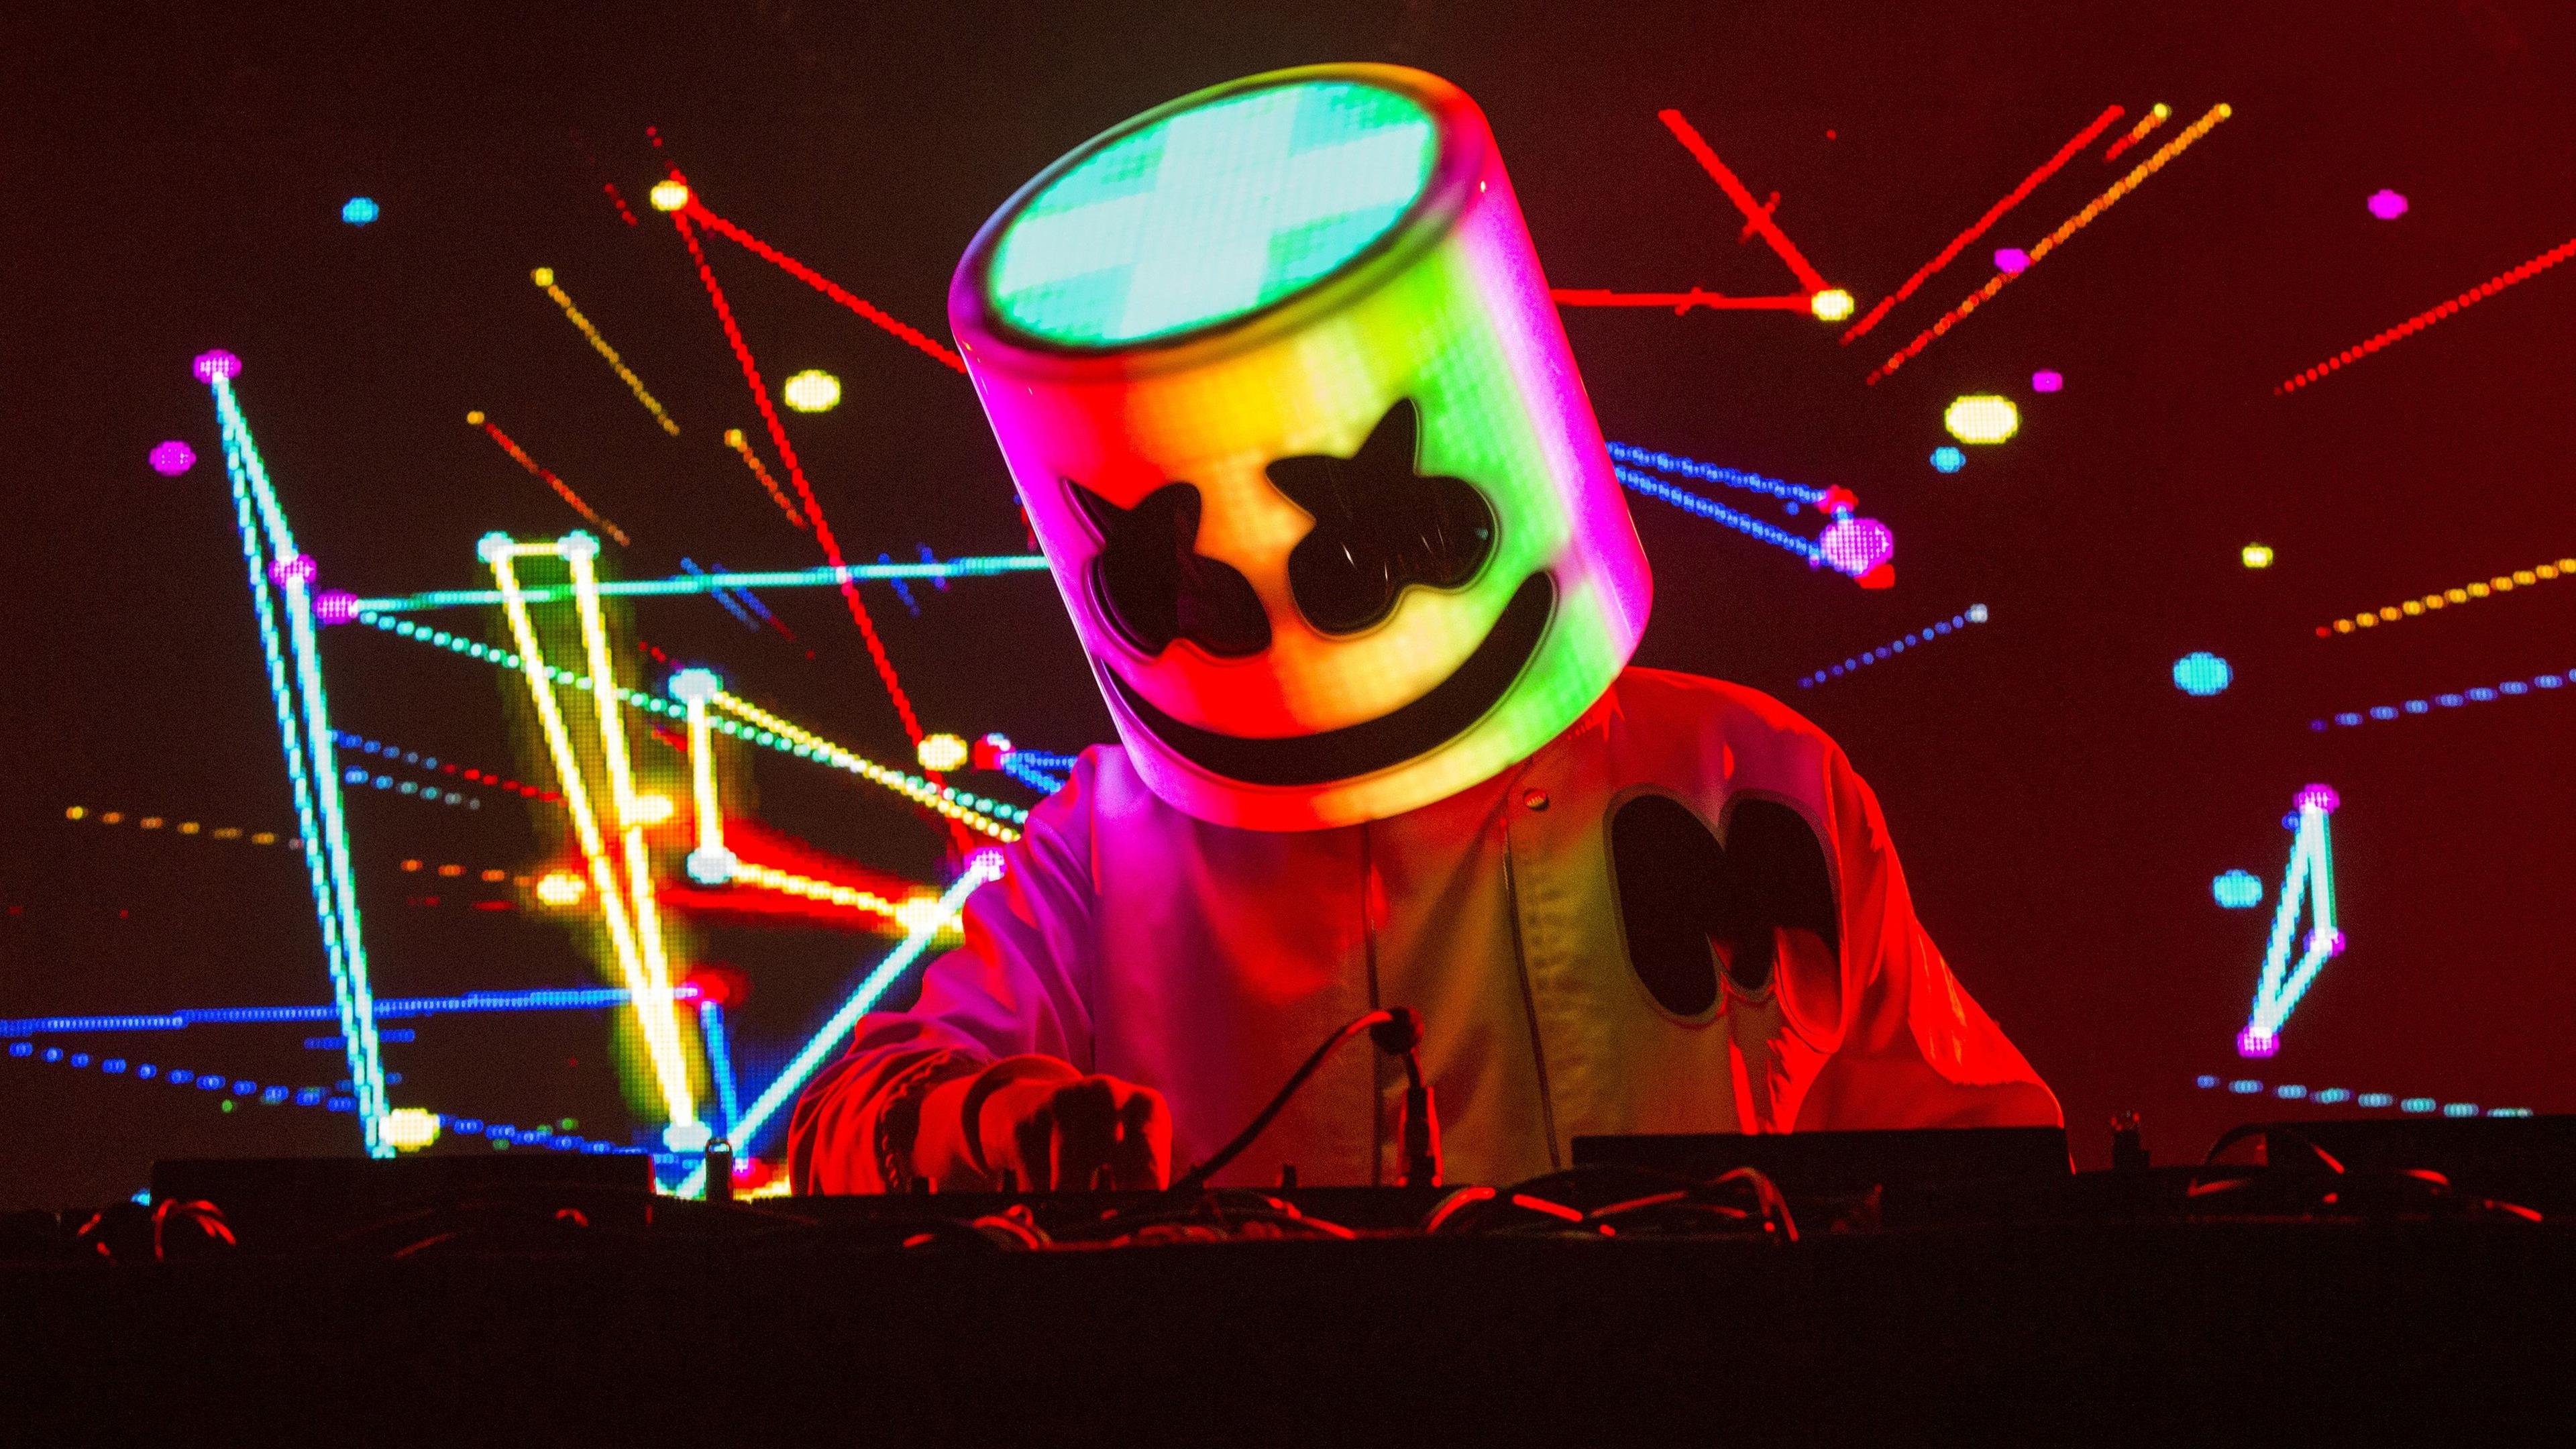 Fondos de pantalla DJ marshmello en concierto